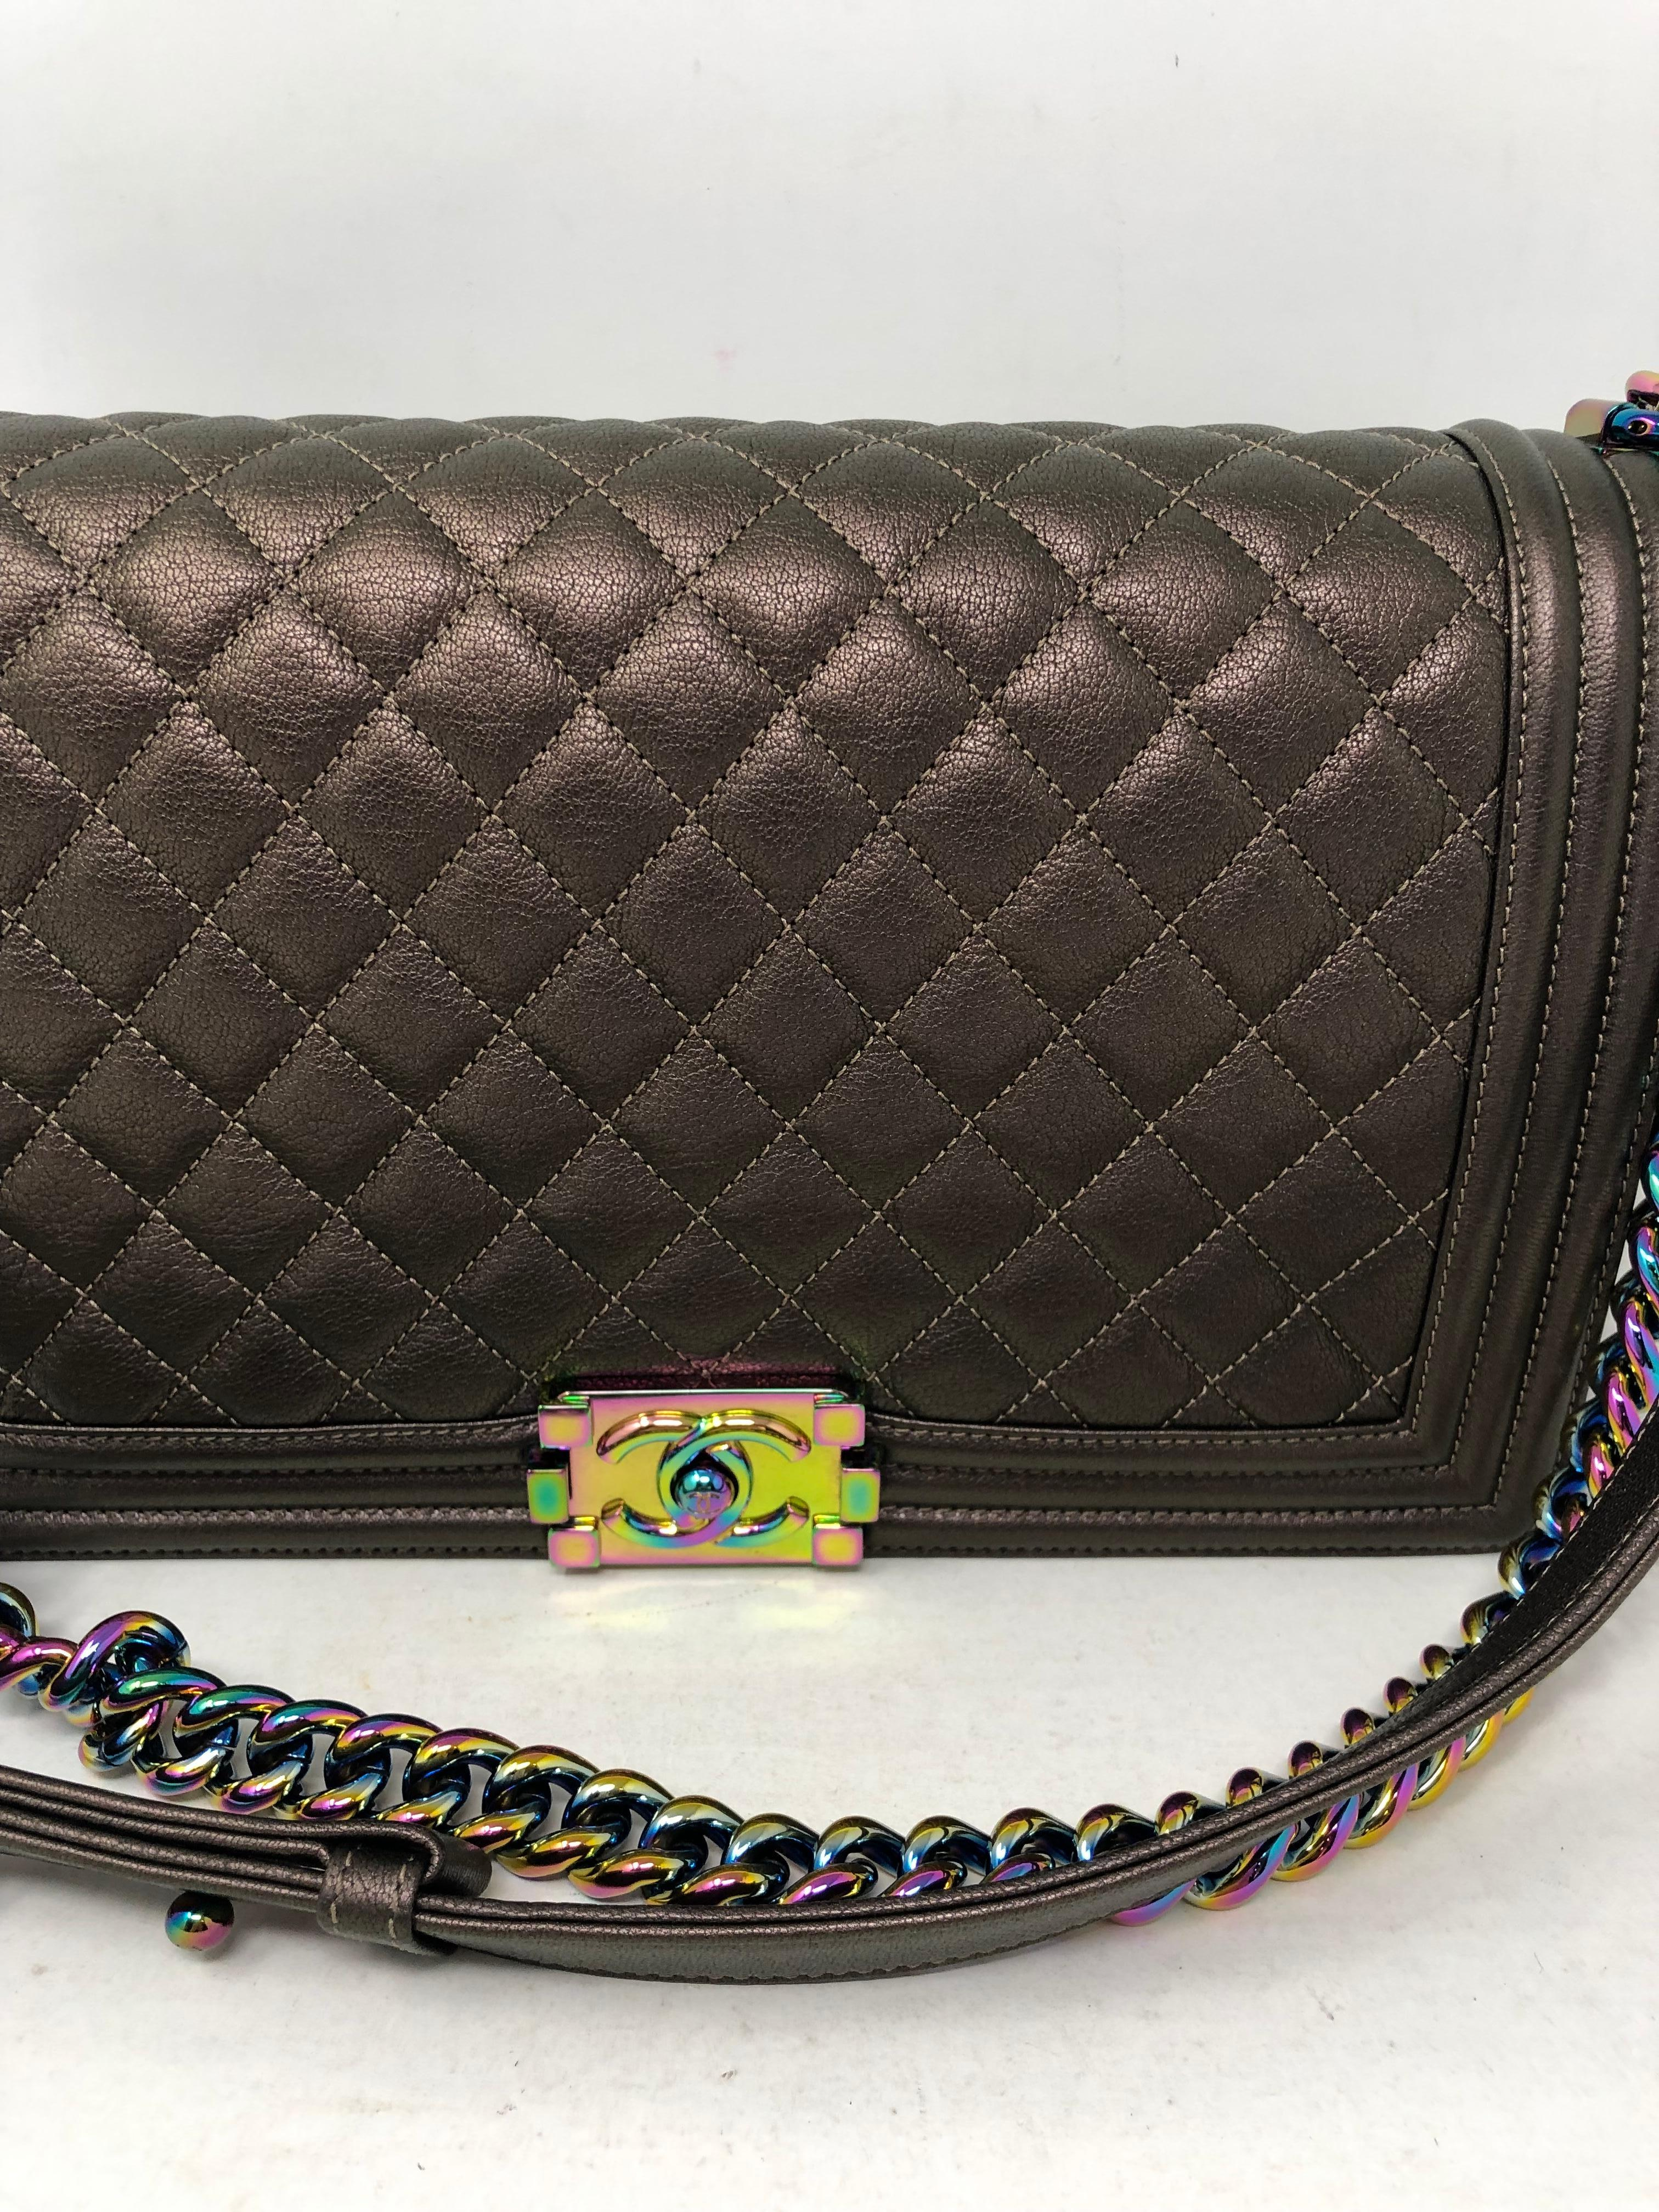 e8390861f0ee Chanel Boy Bag Bronze Mermaid For Sale at 1stdibs